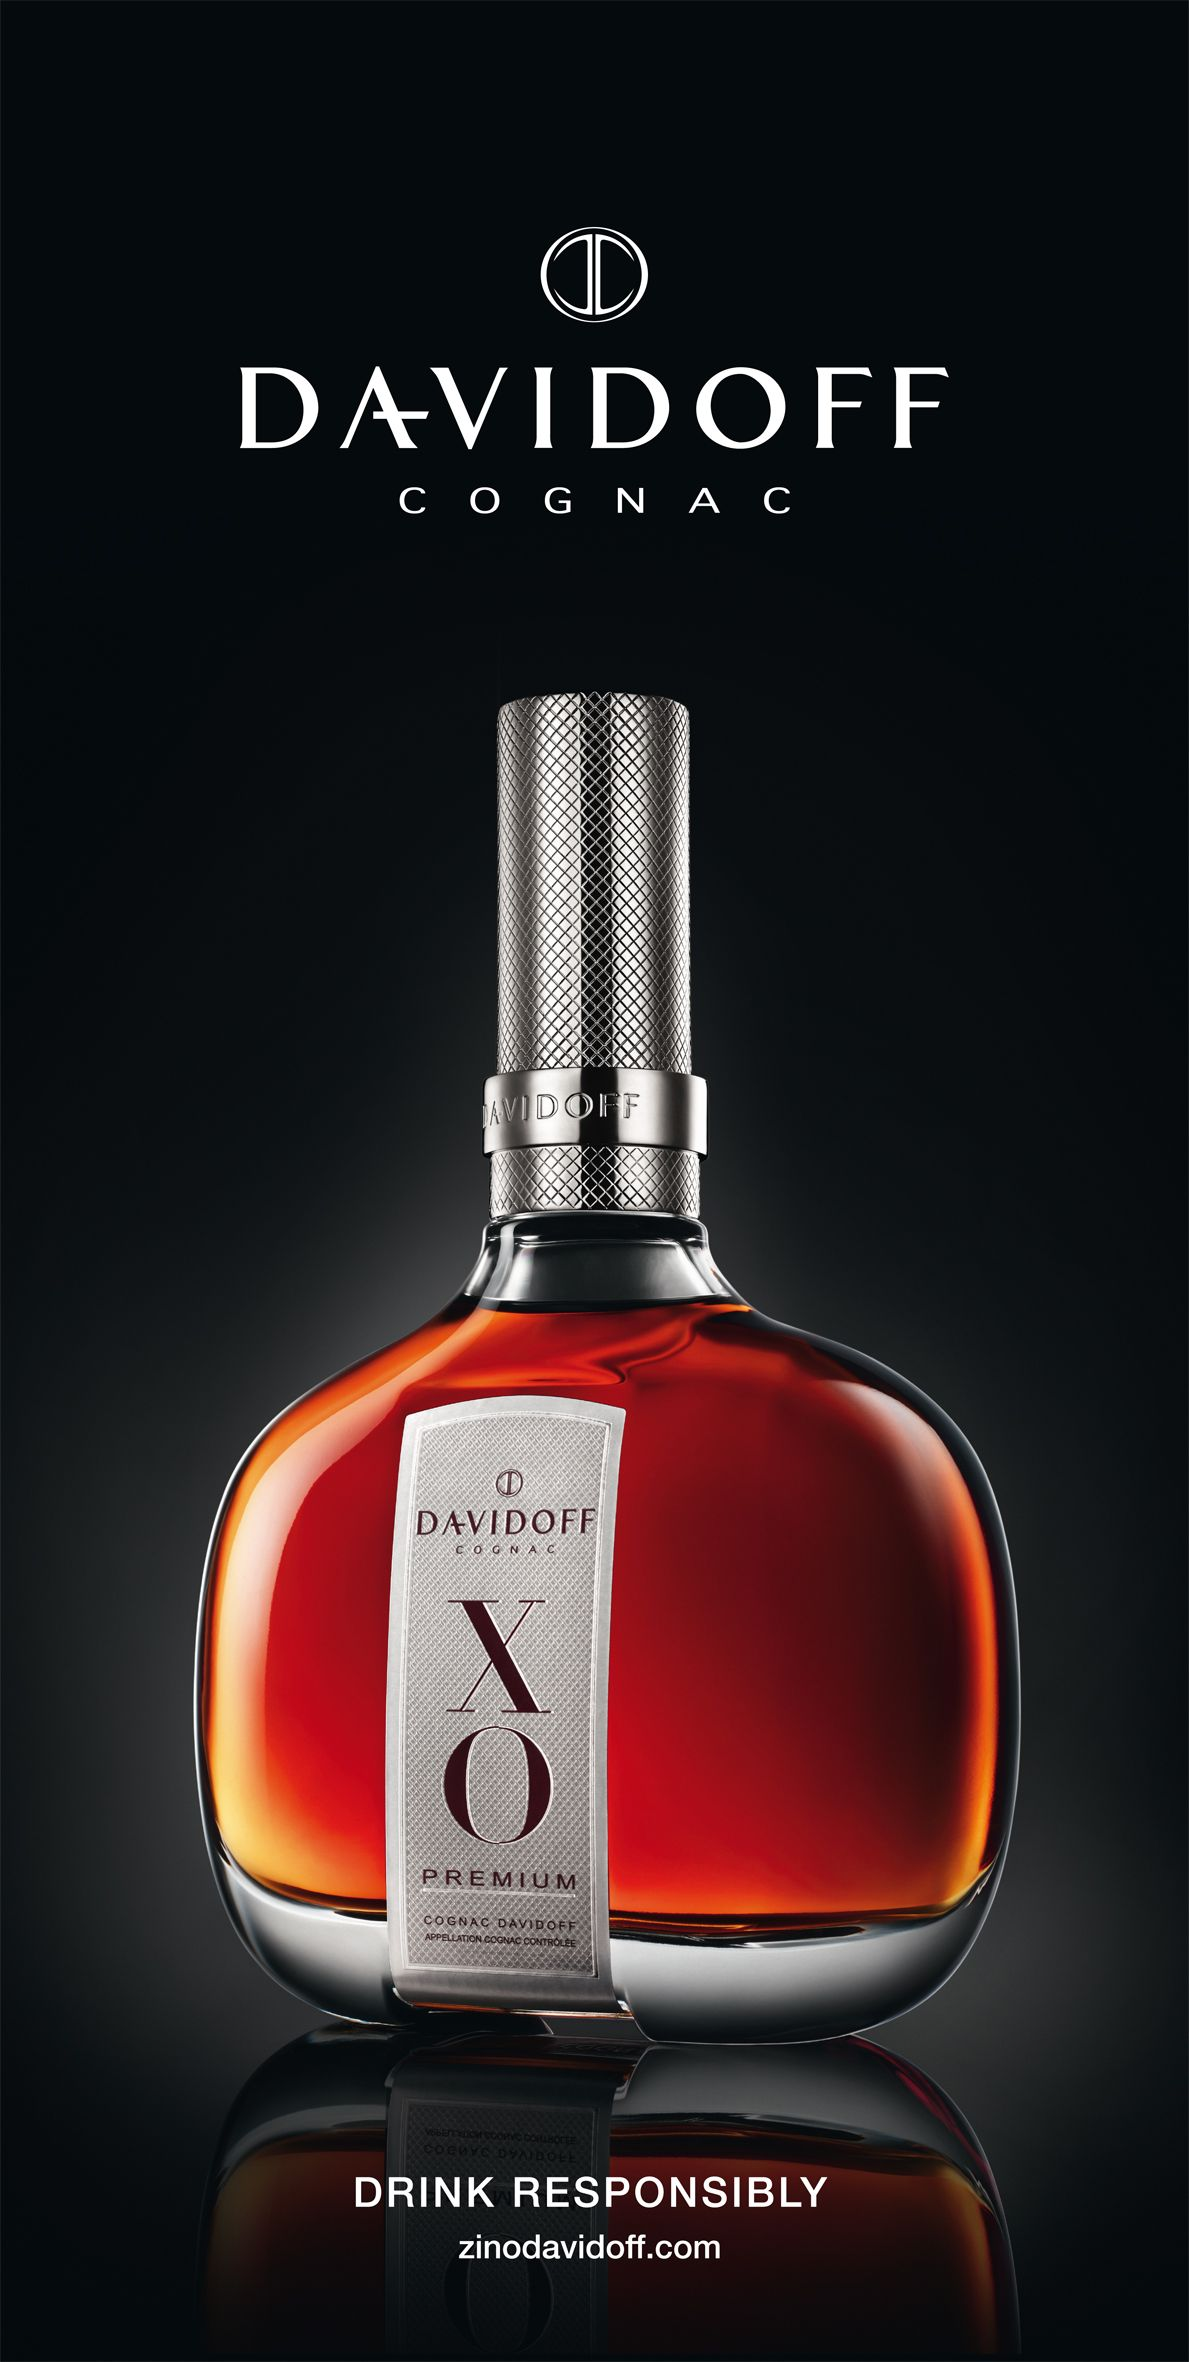 Cognac Davidoff Aeroports Brandy Bottle Cognac Strong Drinks